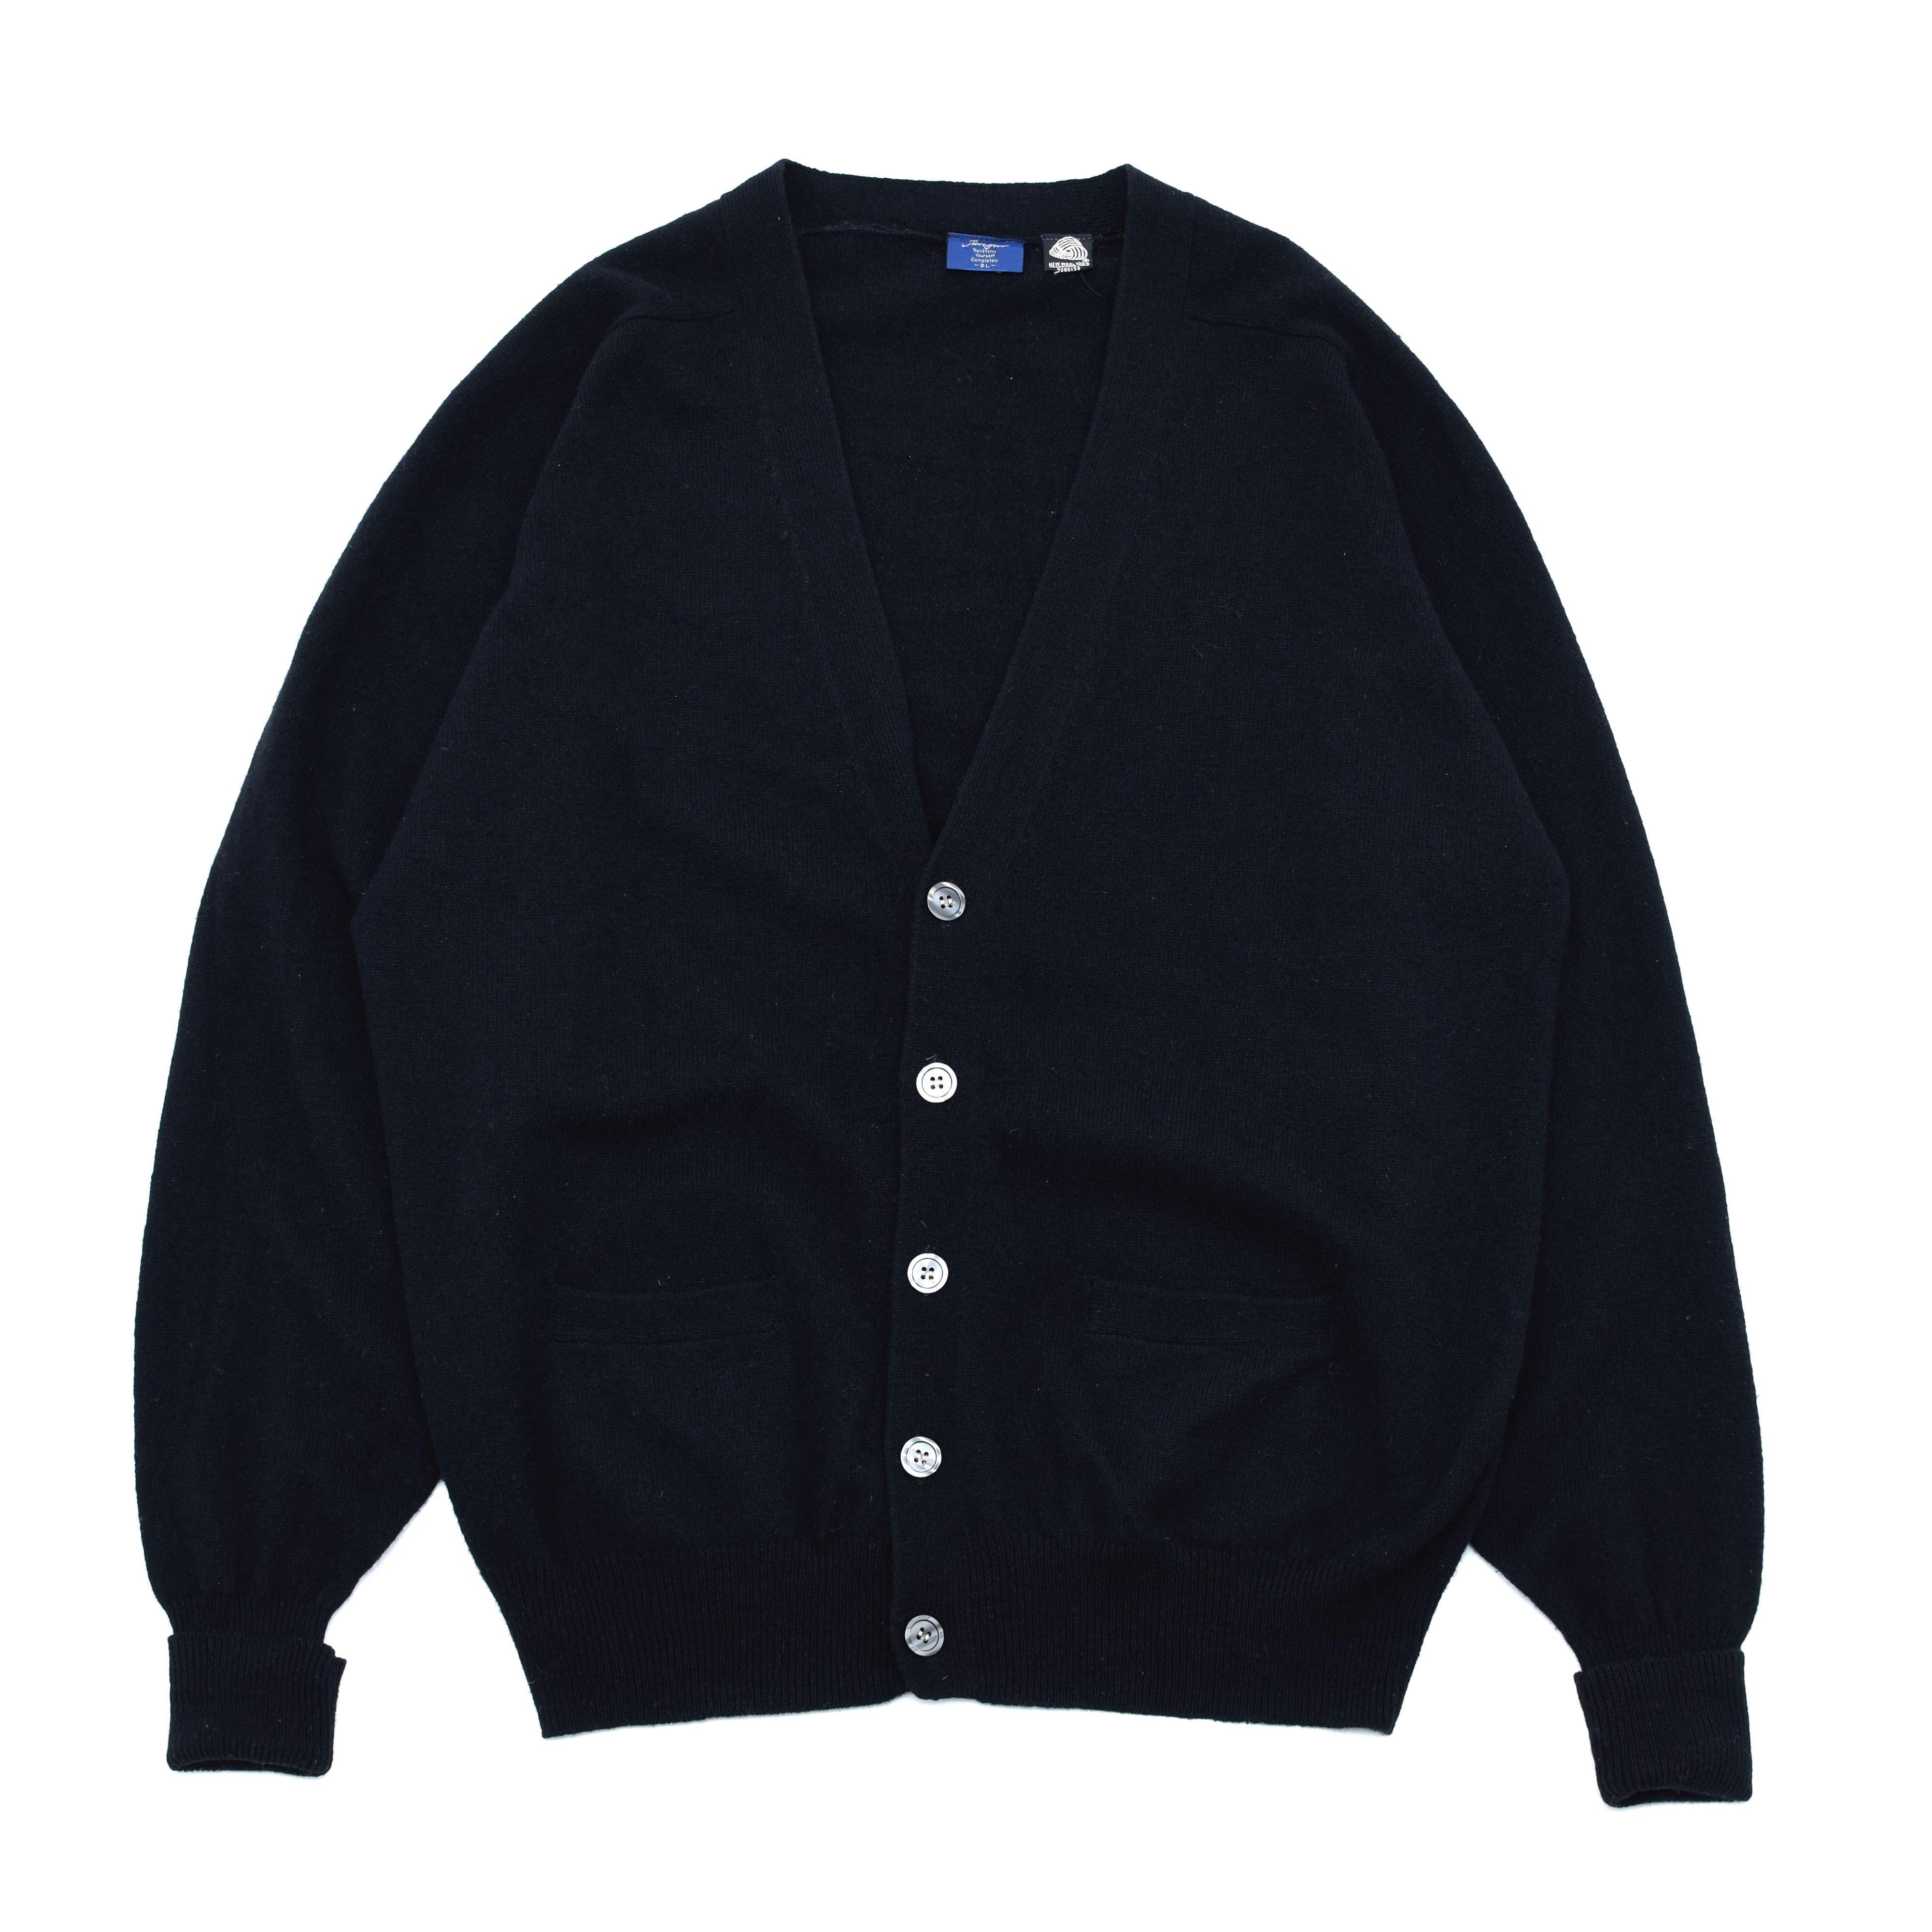 Black wool knit cardigan